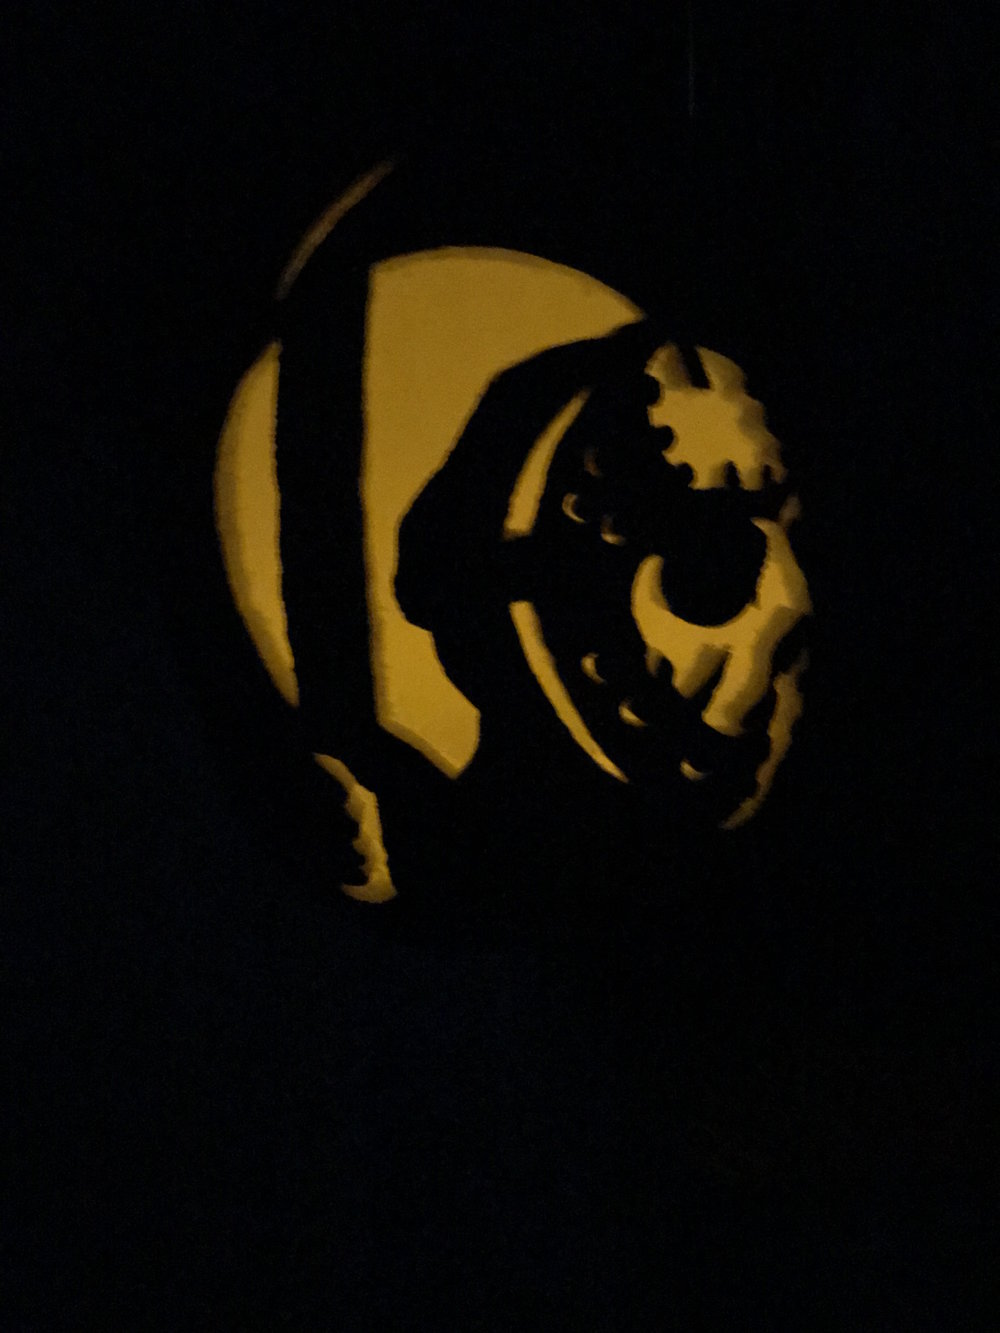 Jason Voorhees Pumpkin